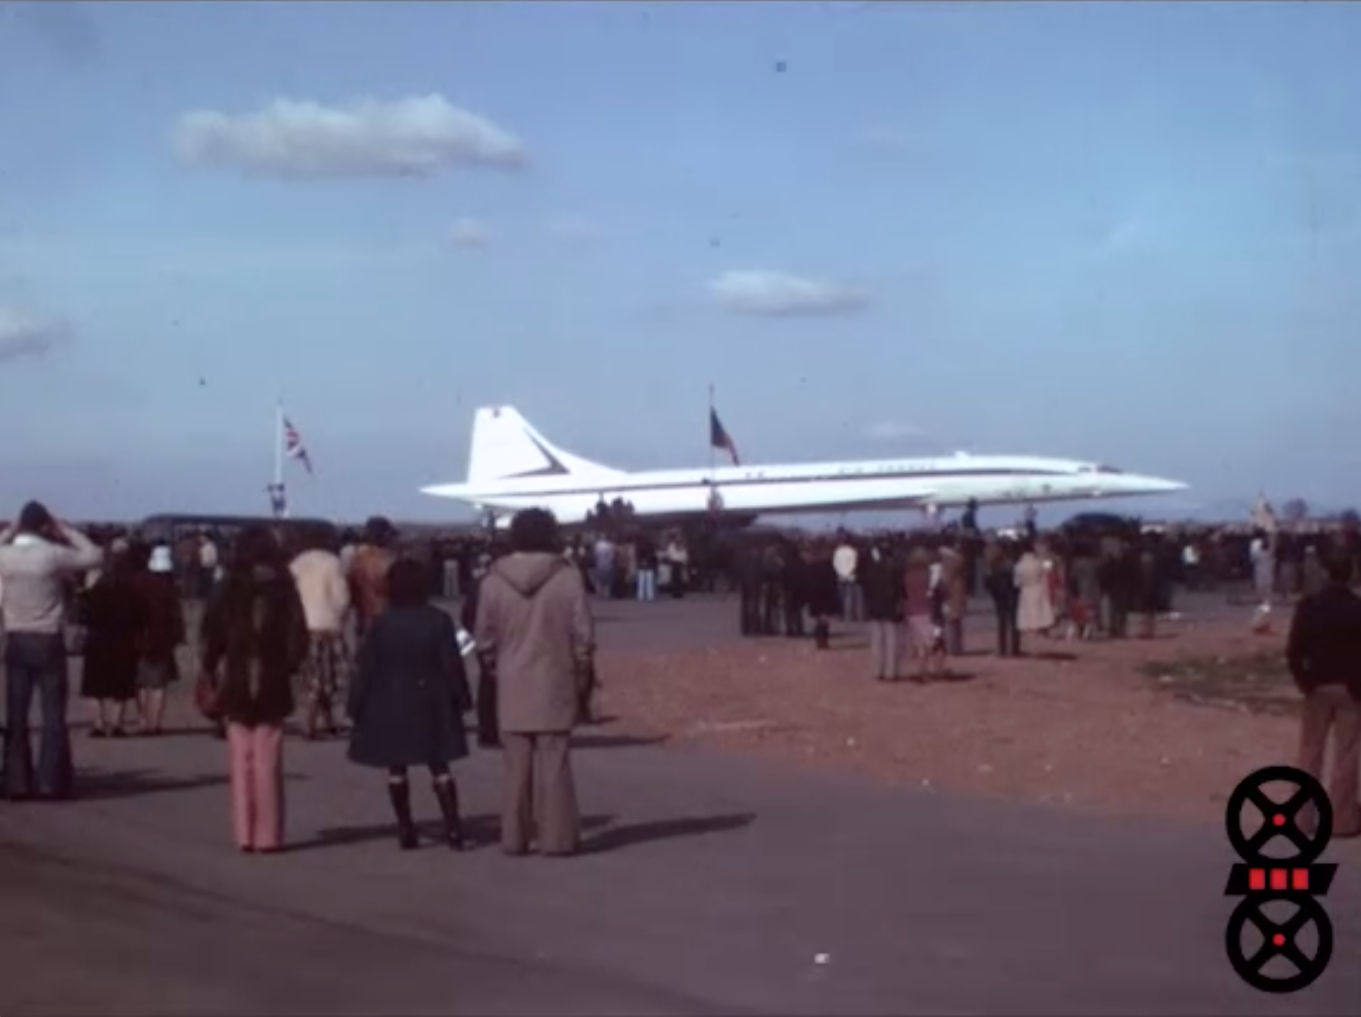 Inauguration de Satolas - Présentation du Concorde